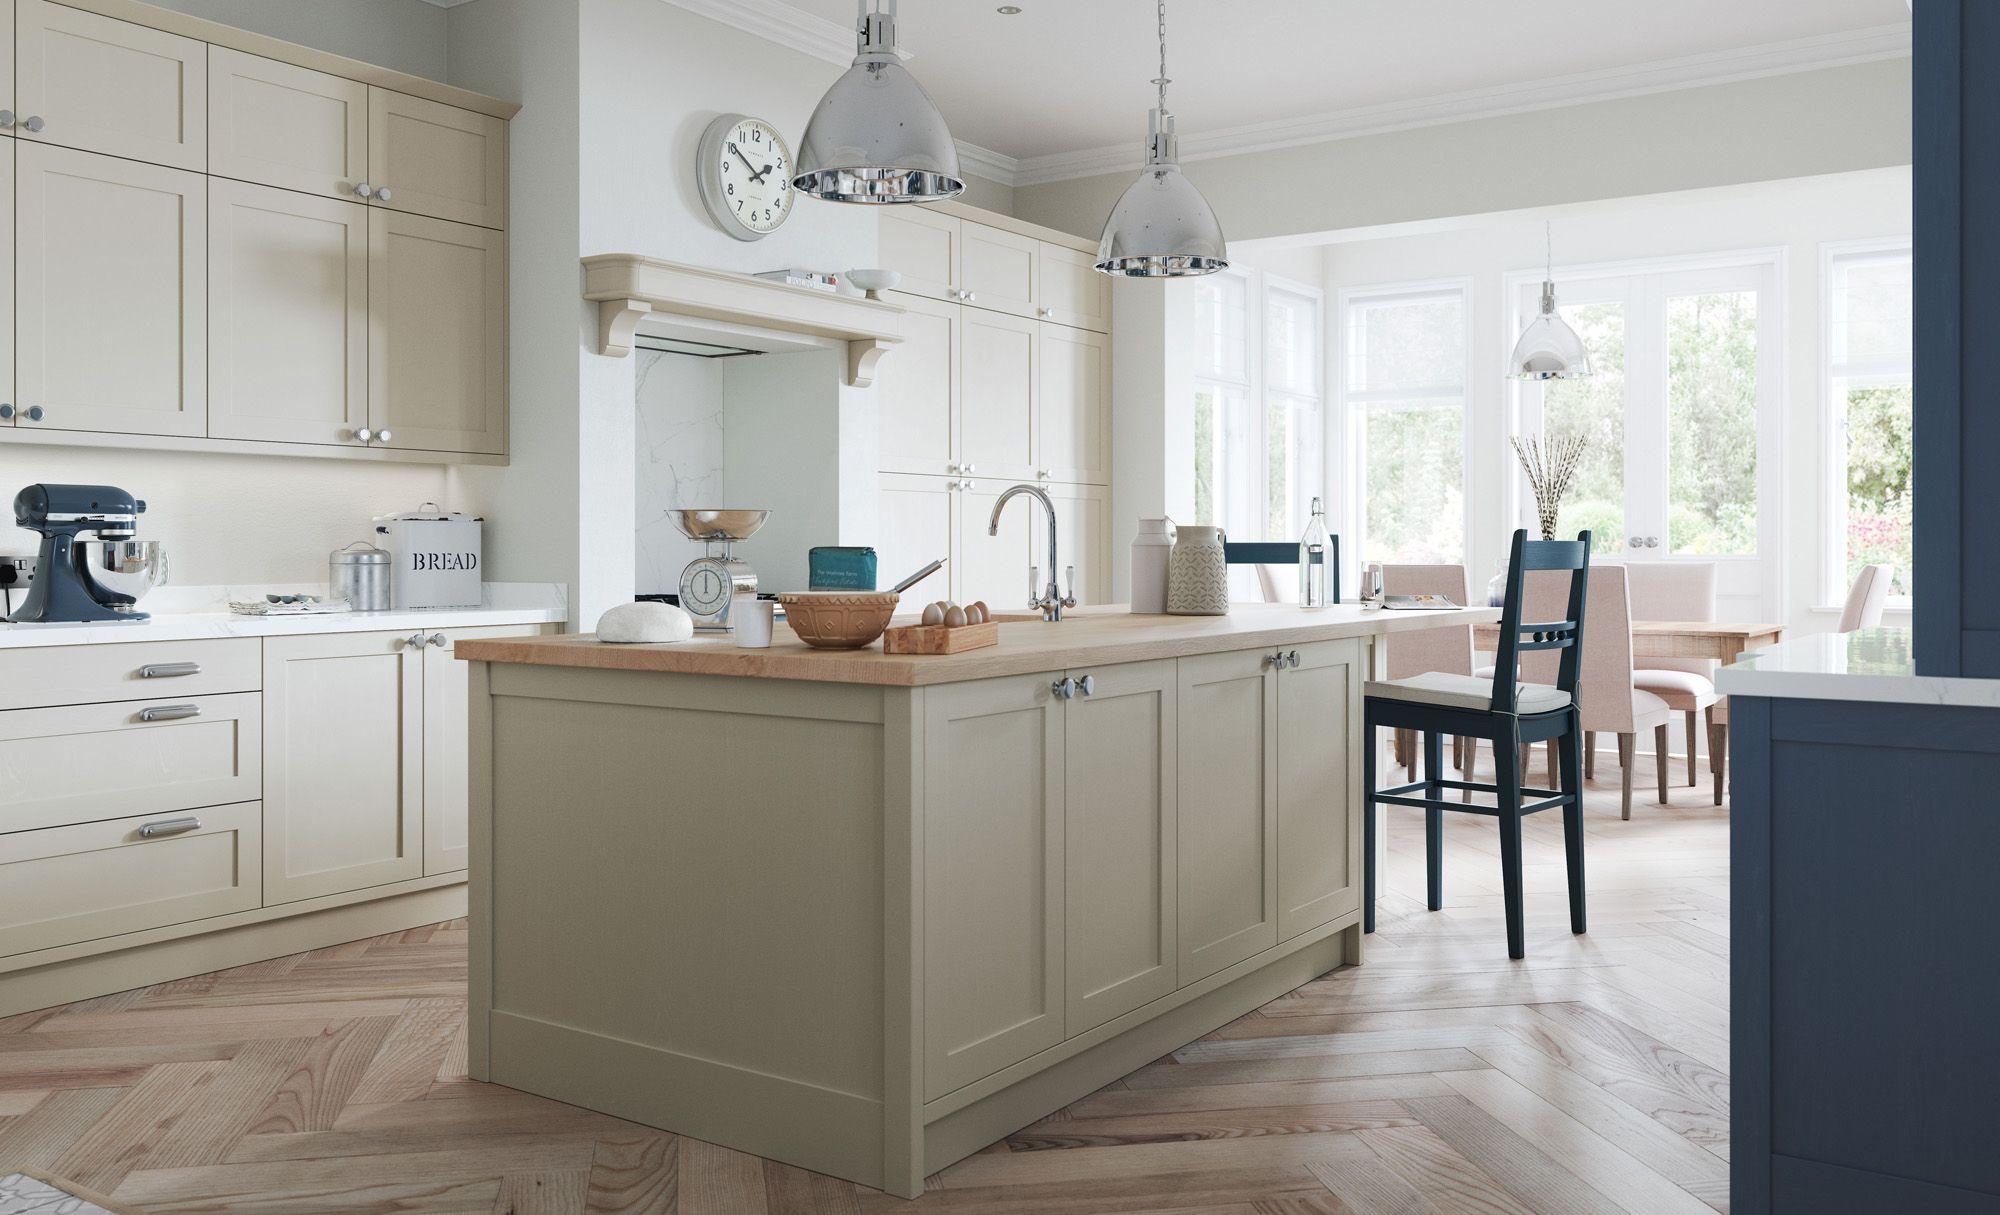 Classic Modern Aldana Shaker Style Kitchen In Painted Stone